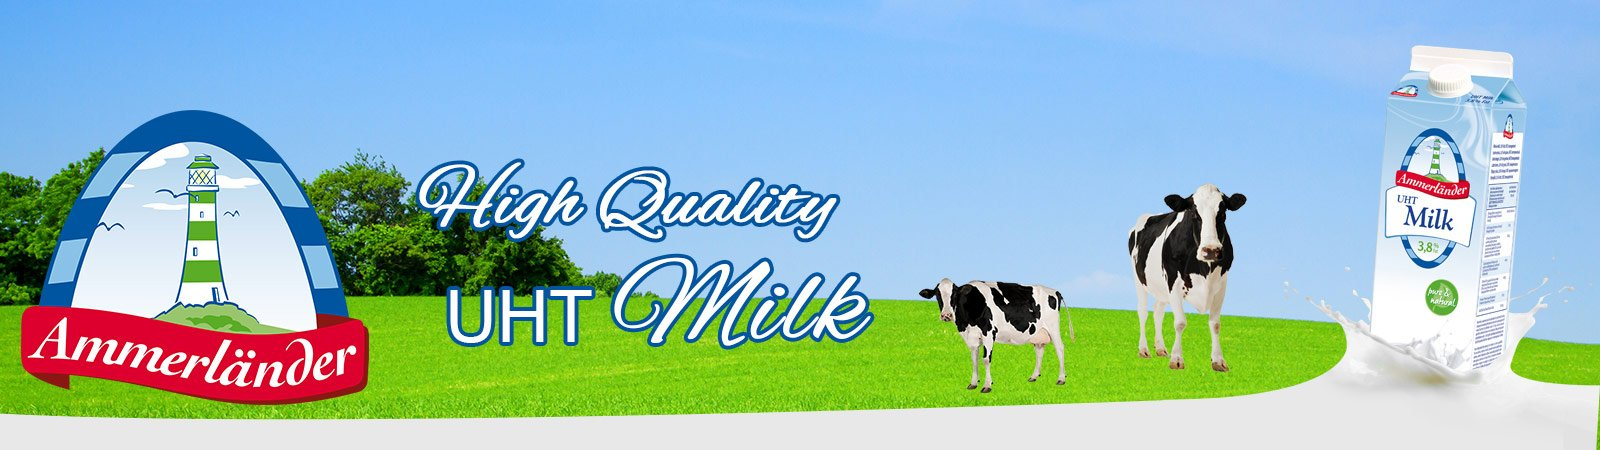 Ammerlander dairy products